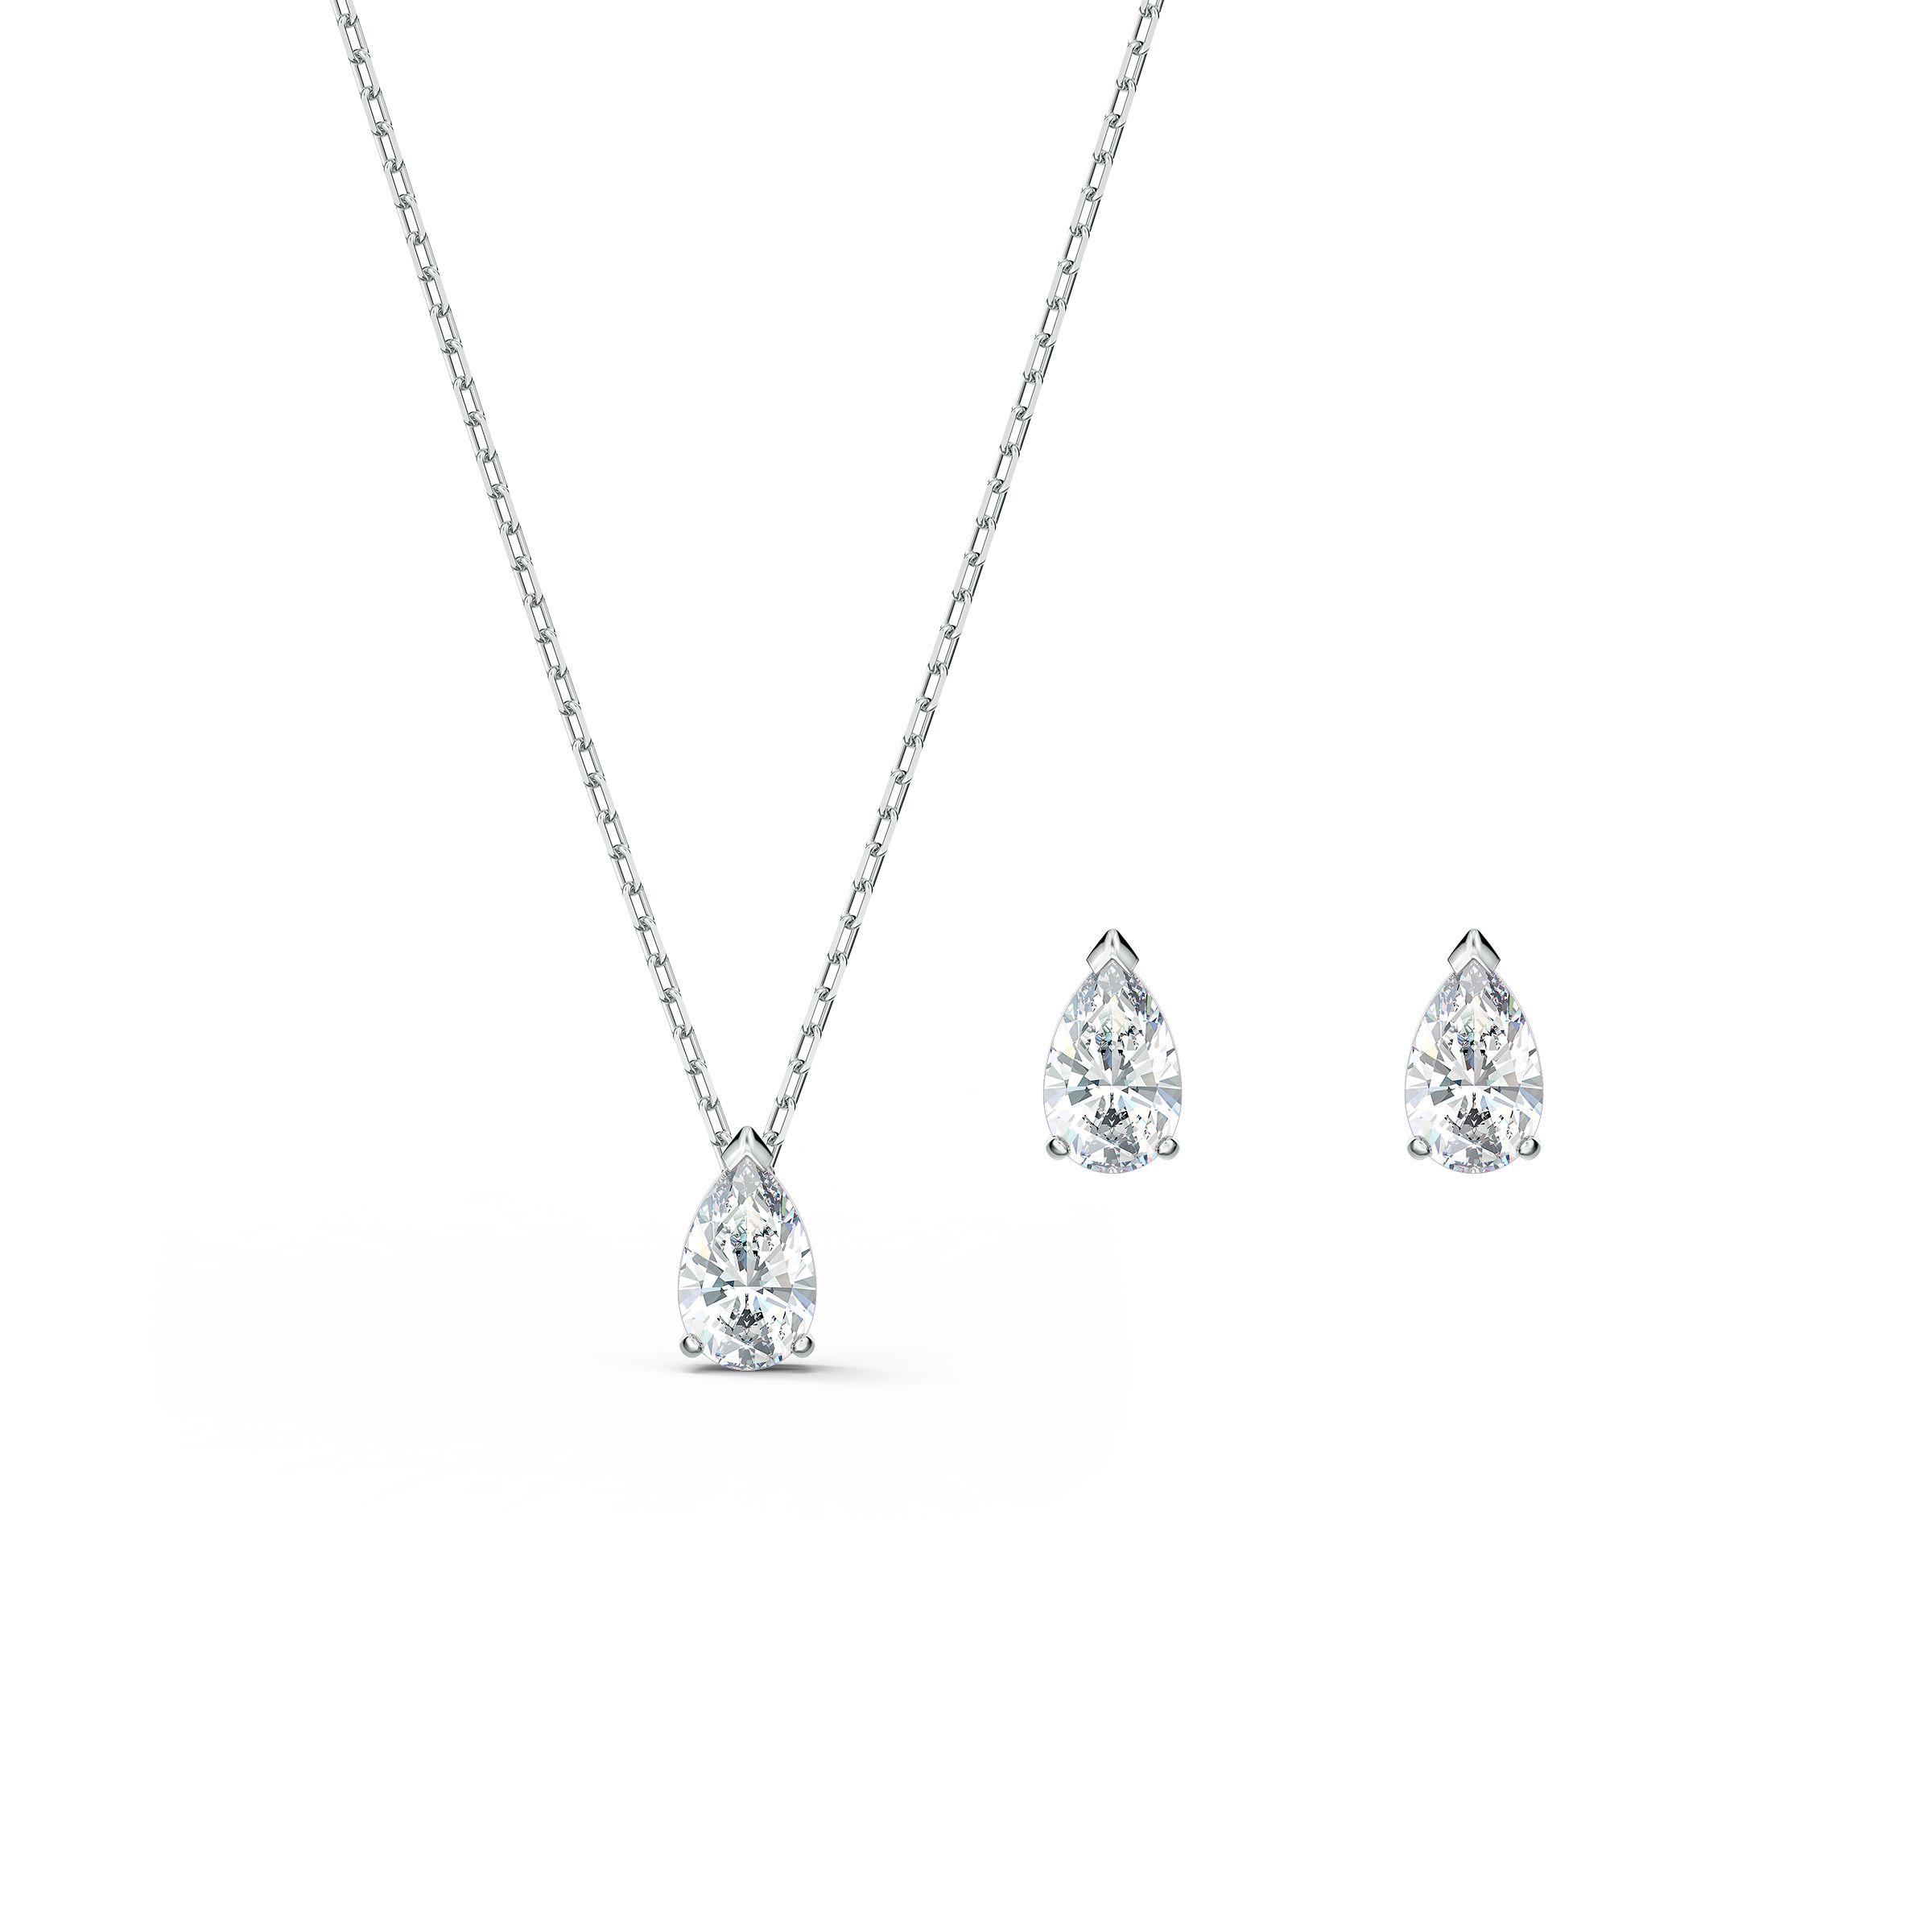 Parure Attract Pear, blanc, métal rhodié, Swarovski